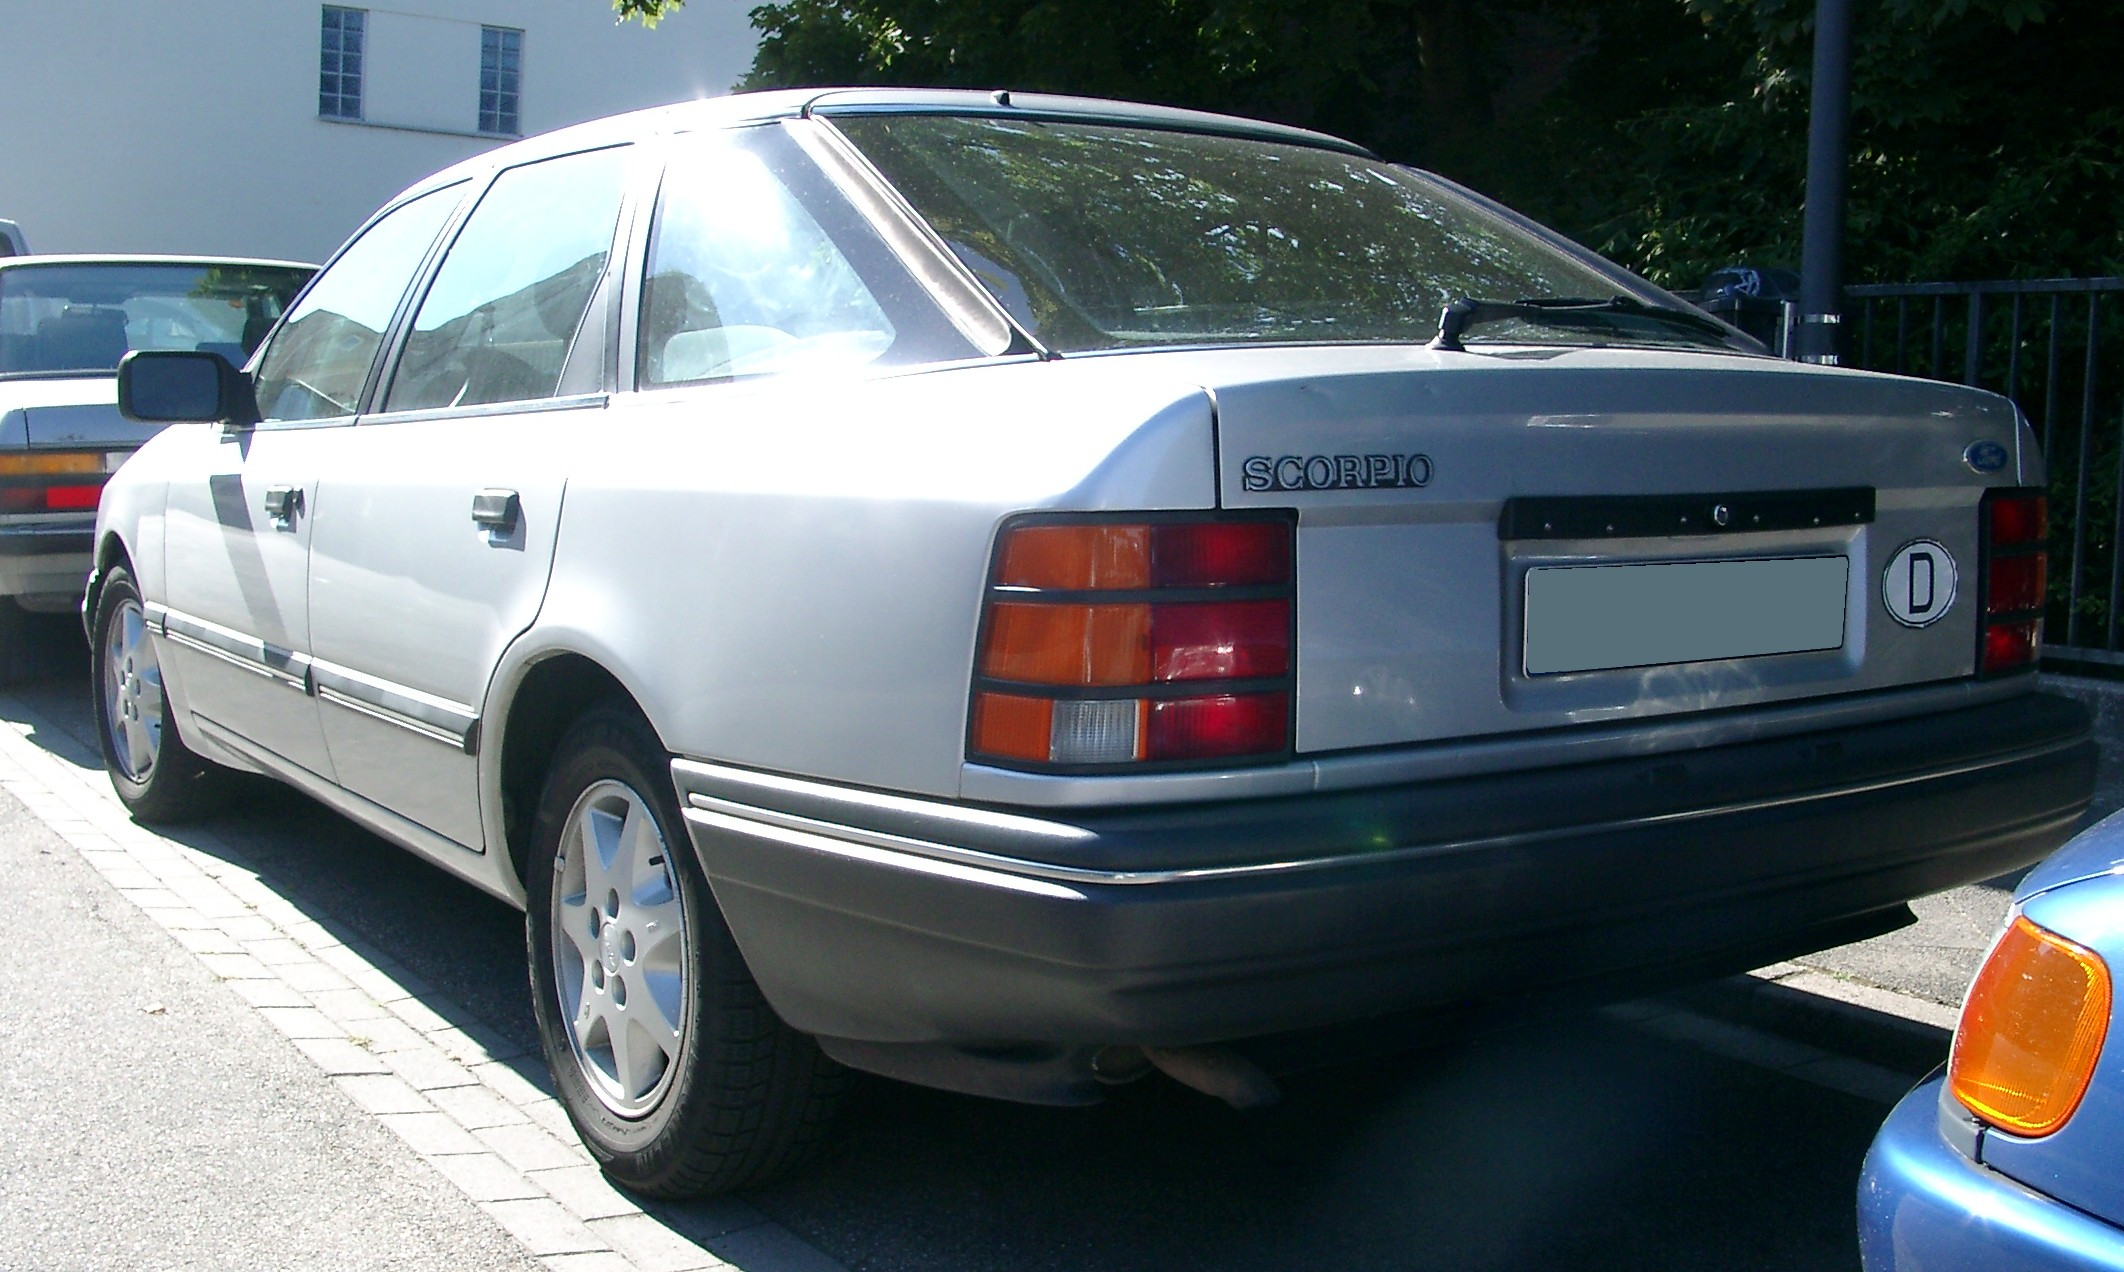 Форд скорпио 1989 фото